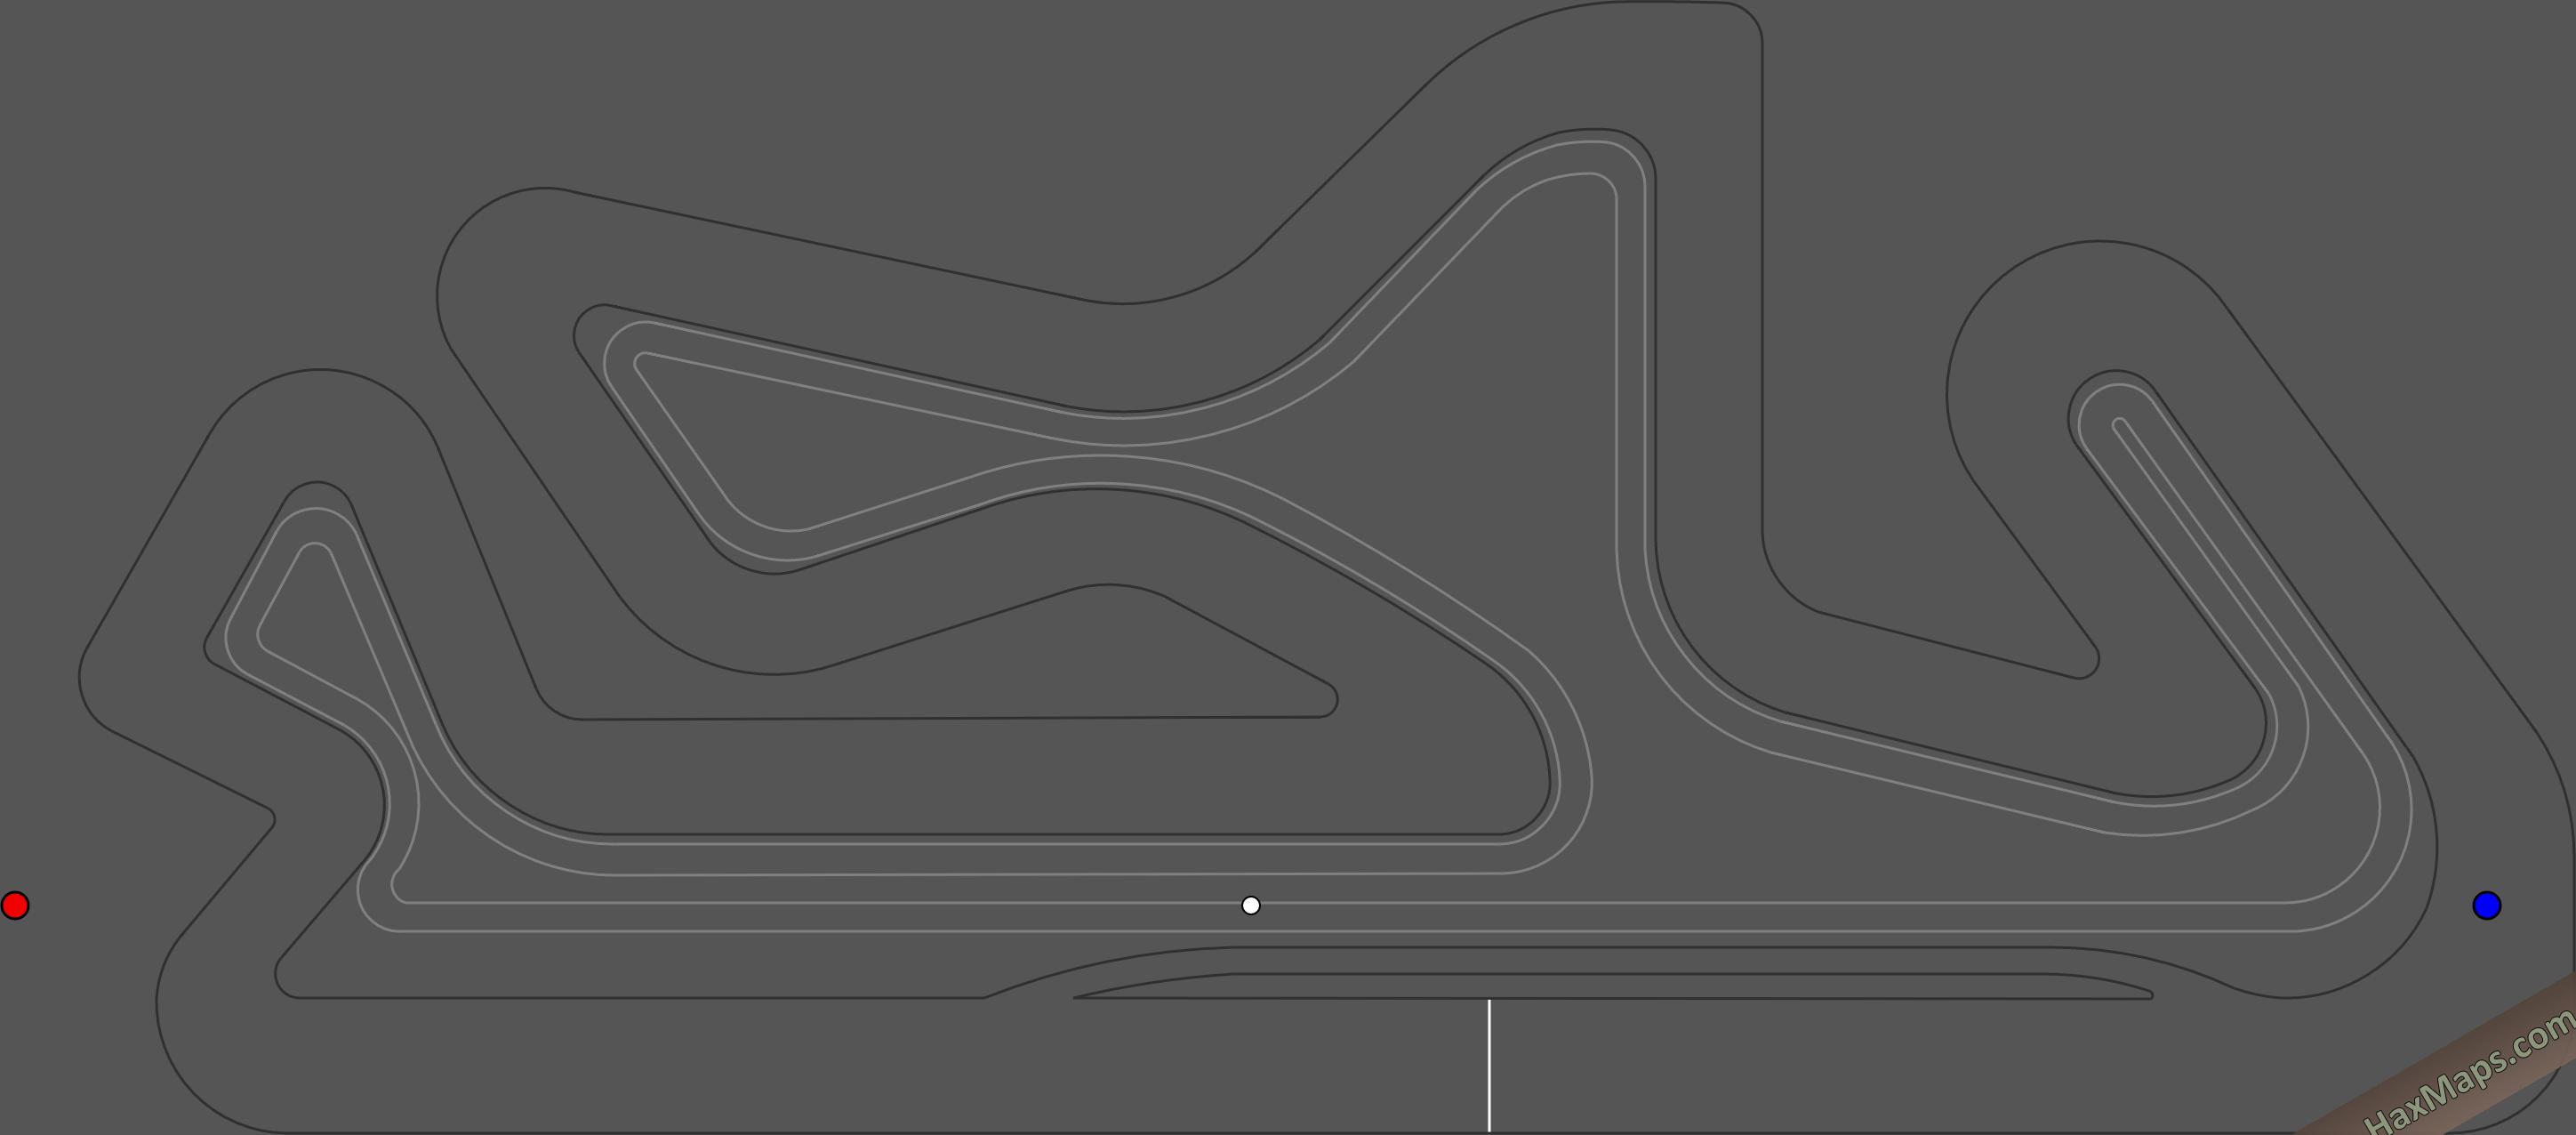 hax ball maps   Q Autodromo Internacional Algavre by POPkORN